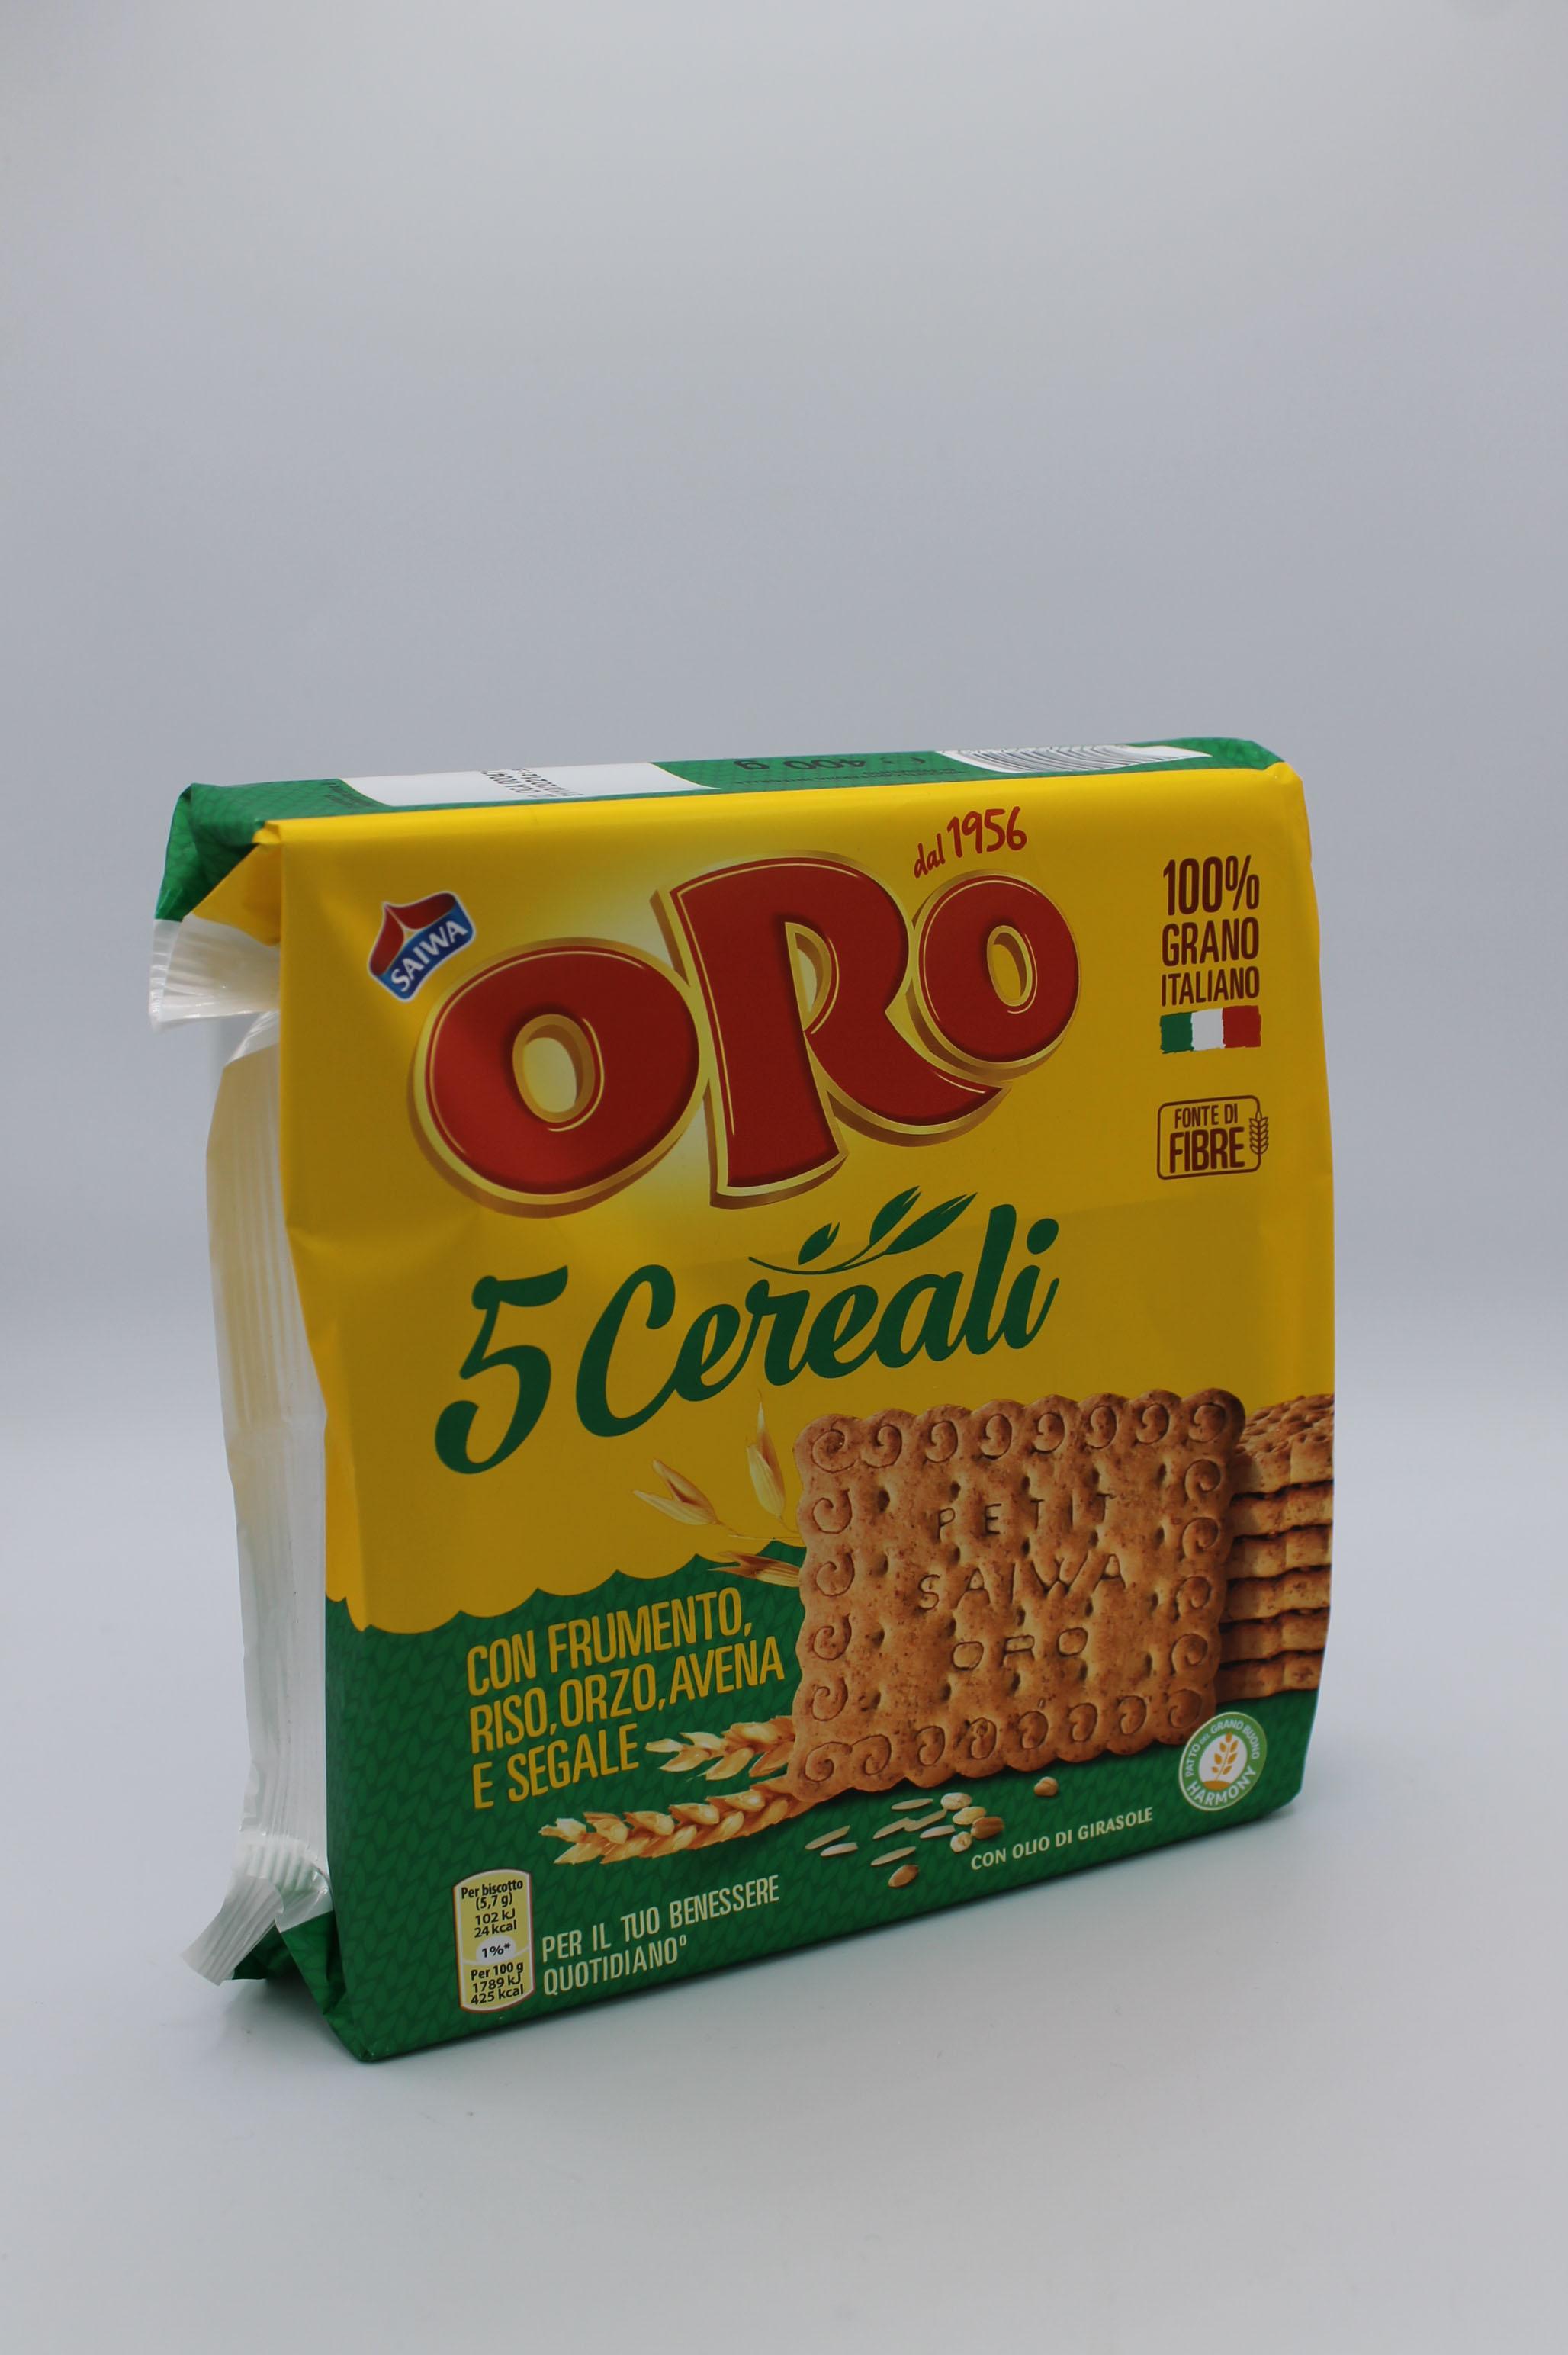 Saiwa biscotti oro 5 cereali 400 gr.